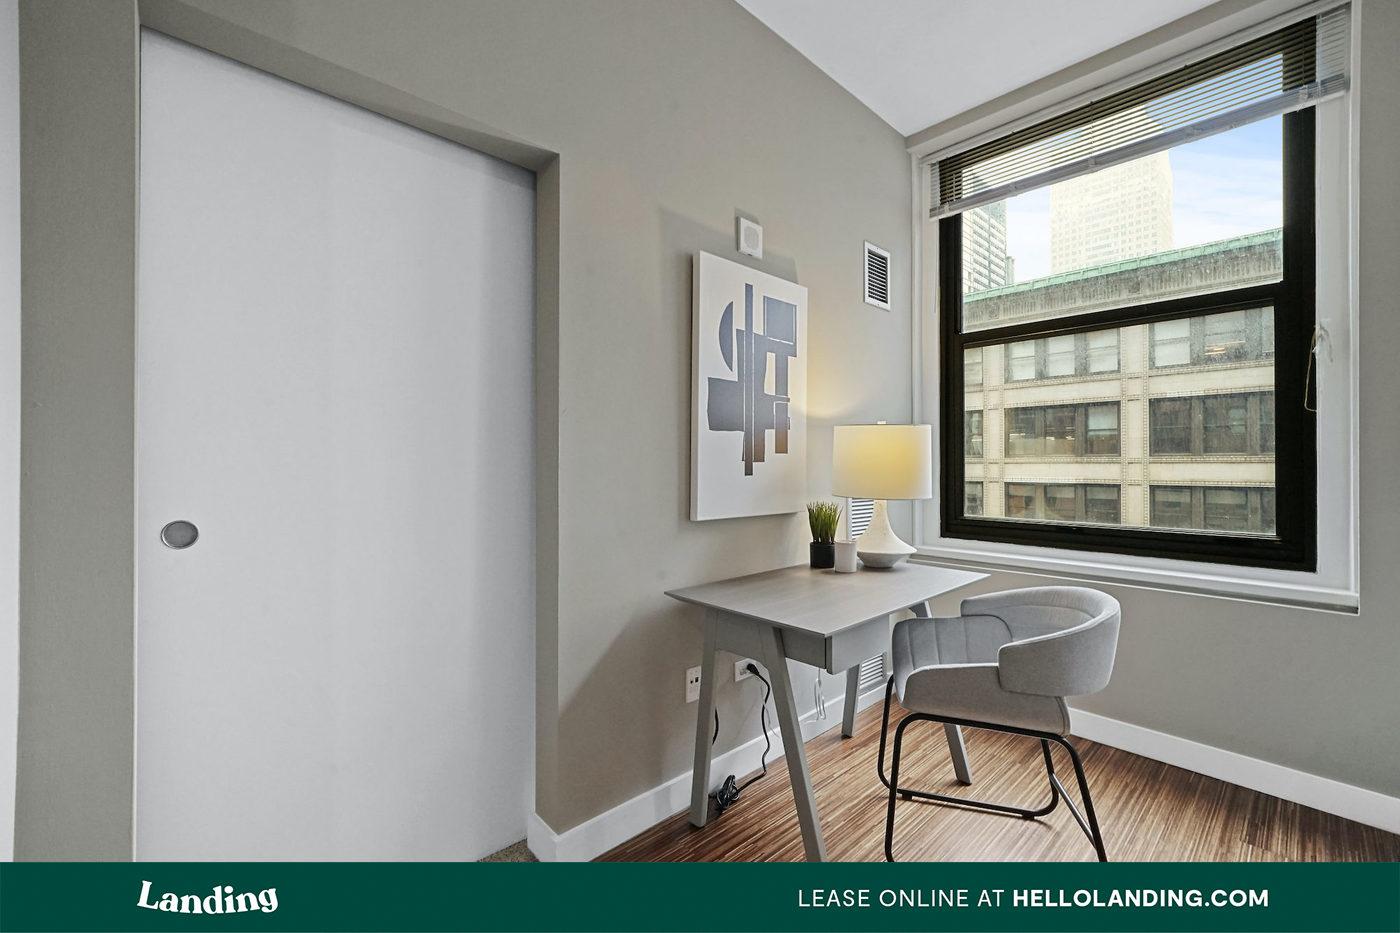 MDA City Club Apartments rental